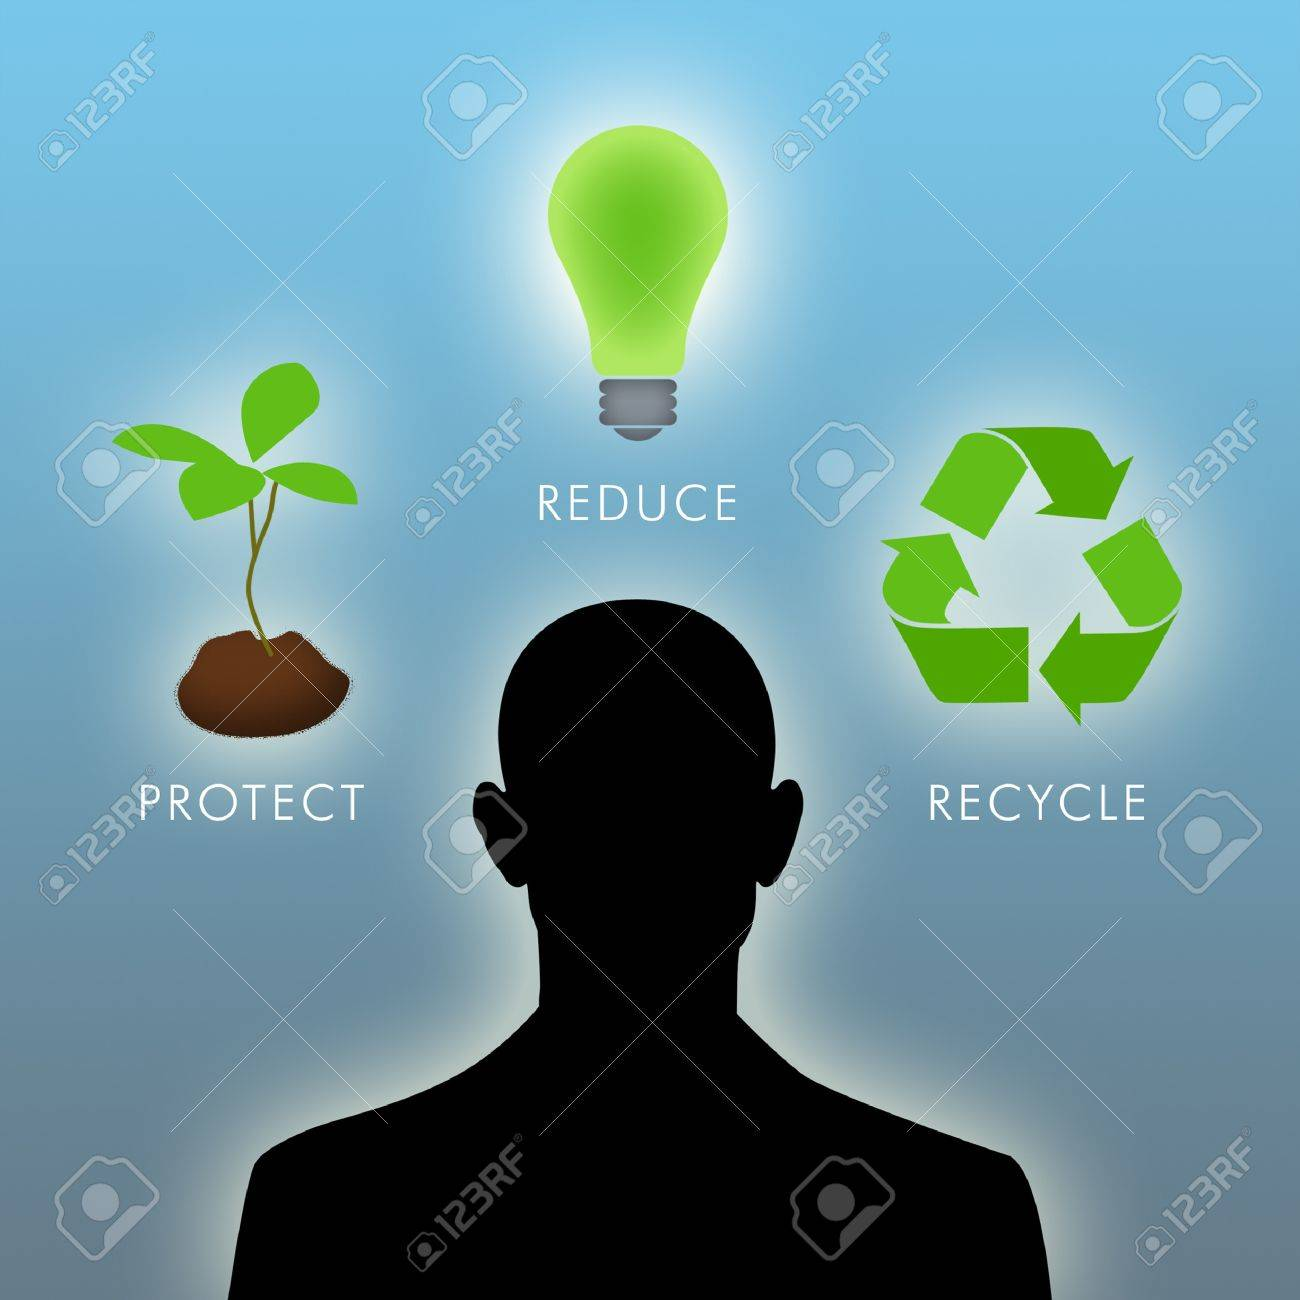 Illustration of man thinking of environmental things. - 8524450